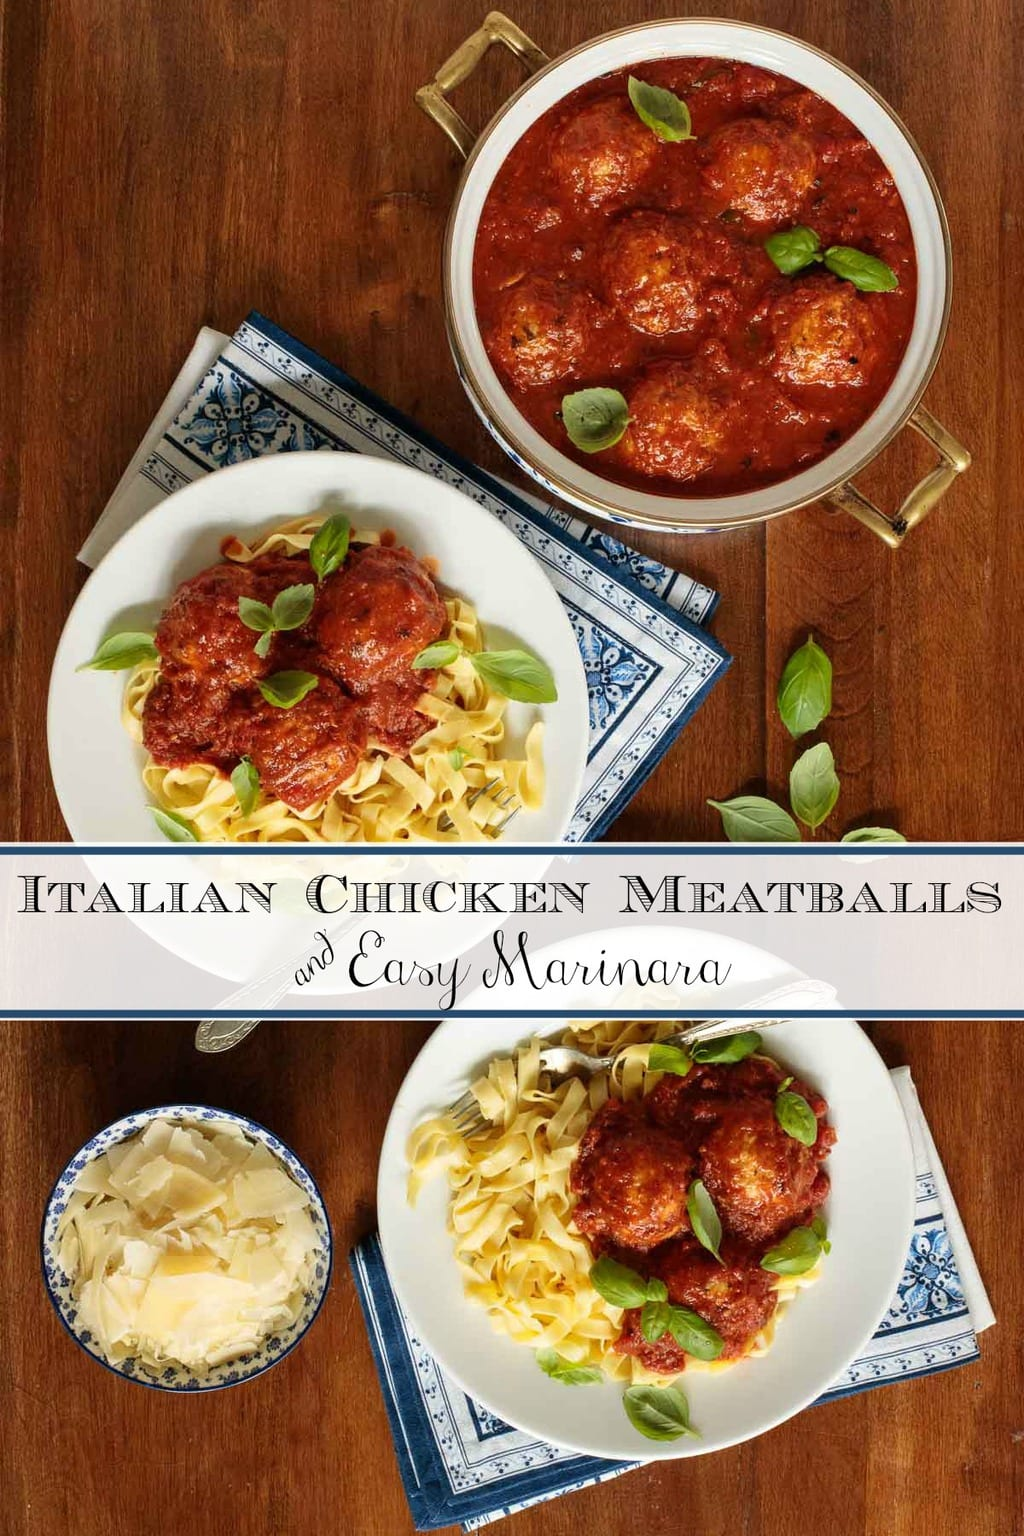 Italian Chicken Meatballs and Marinara